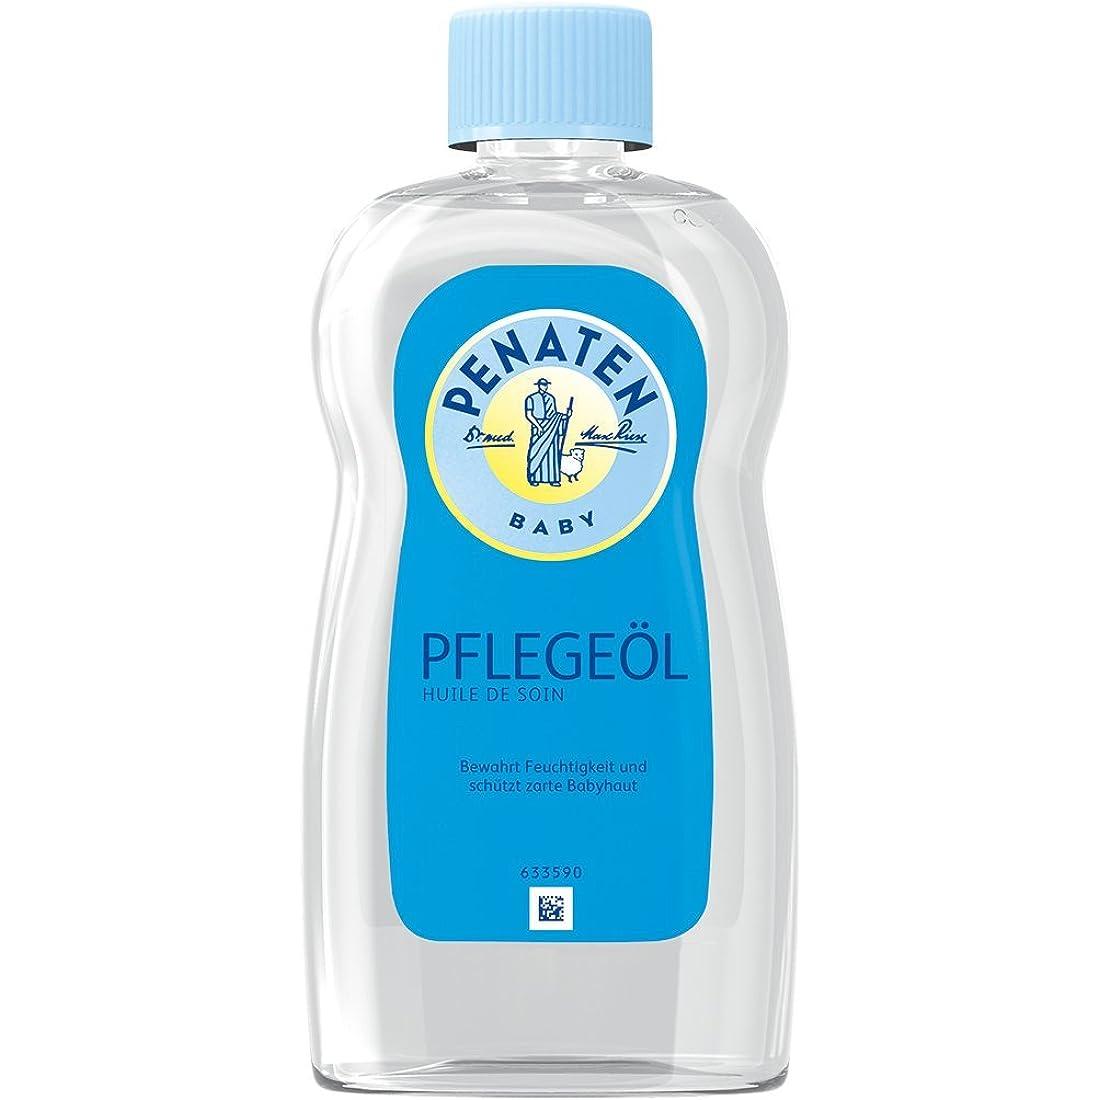 Penaten Pflegeöl